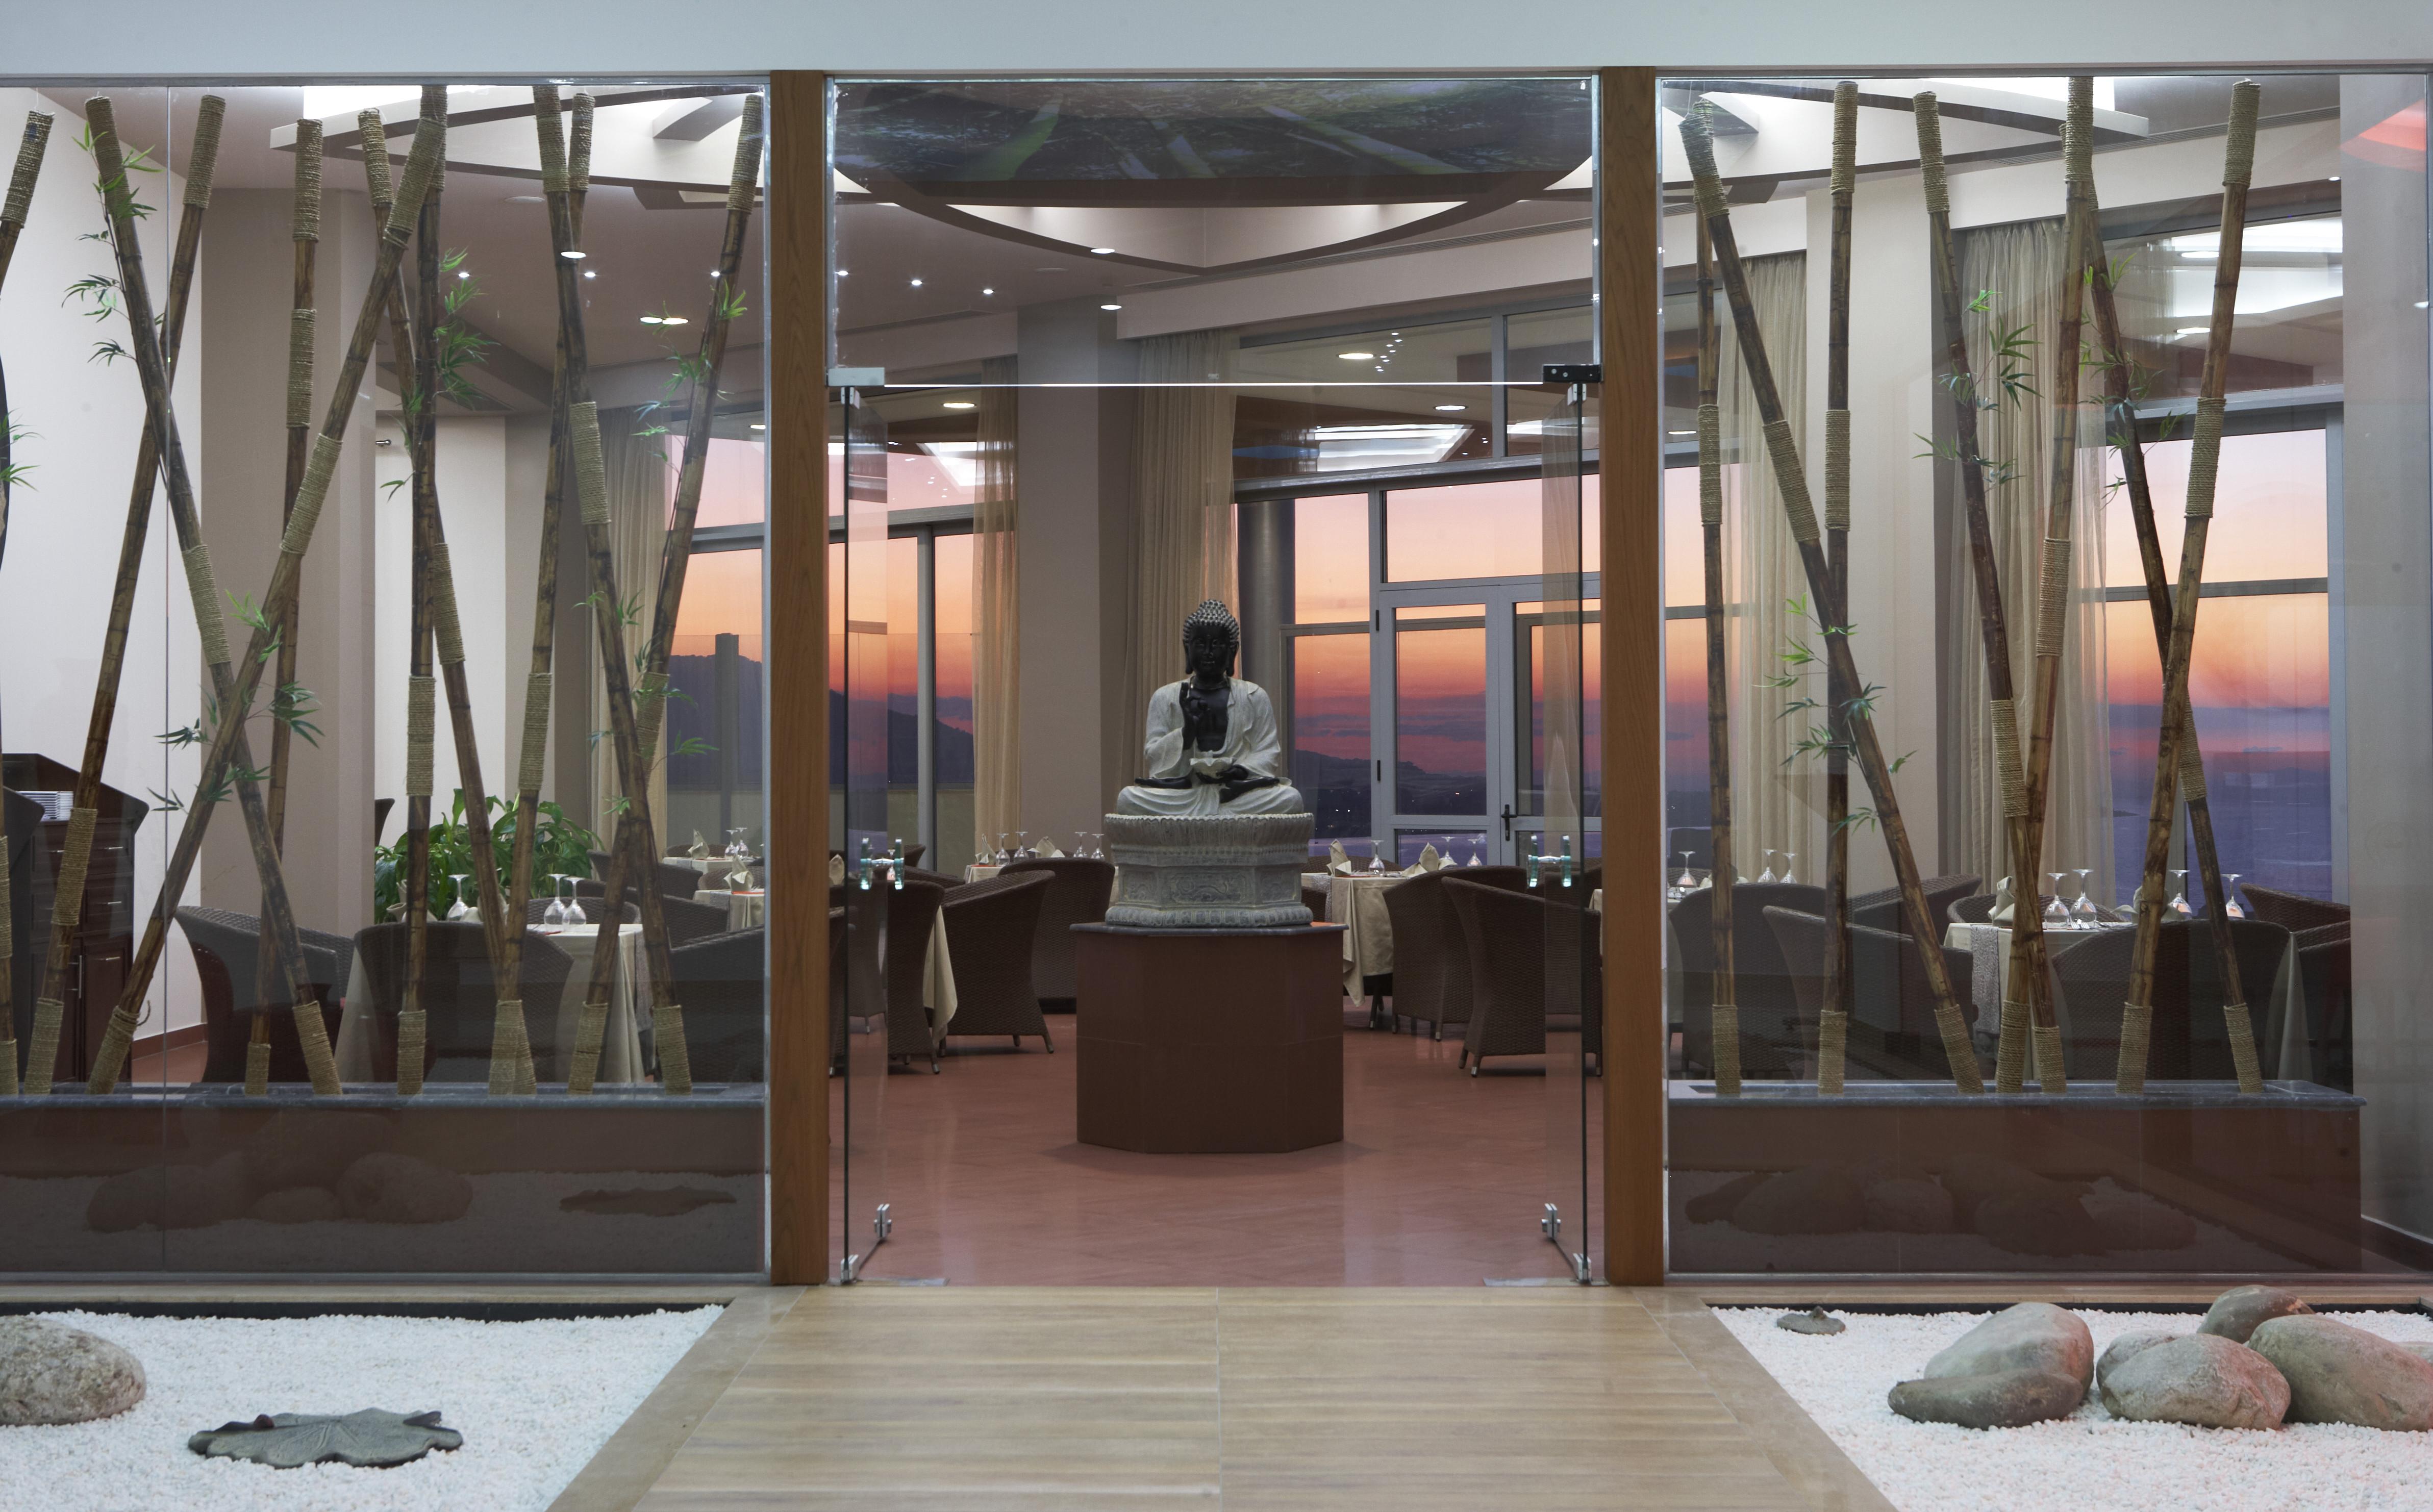 Koi gourmet restaurant